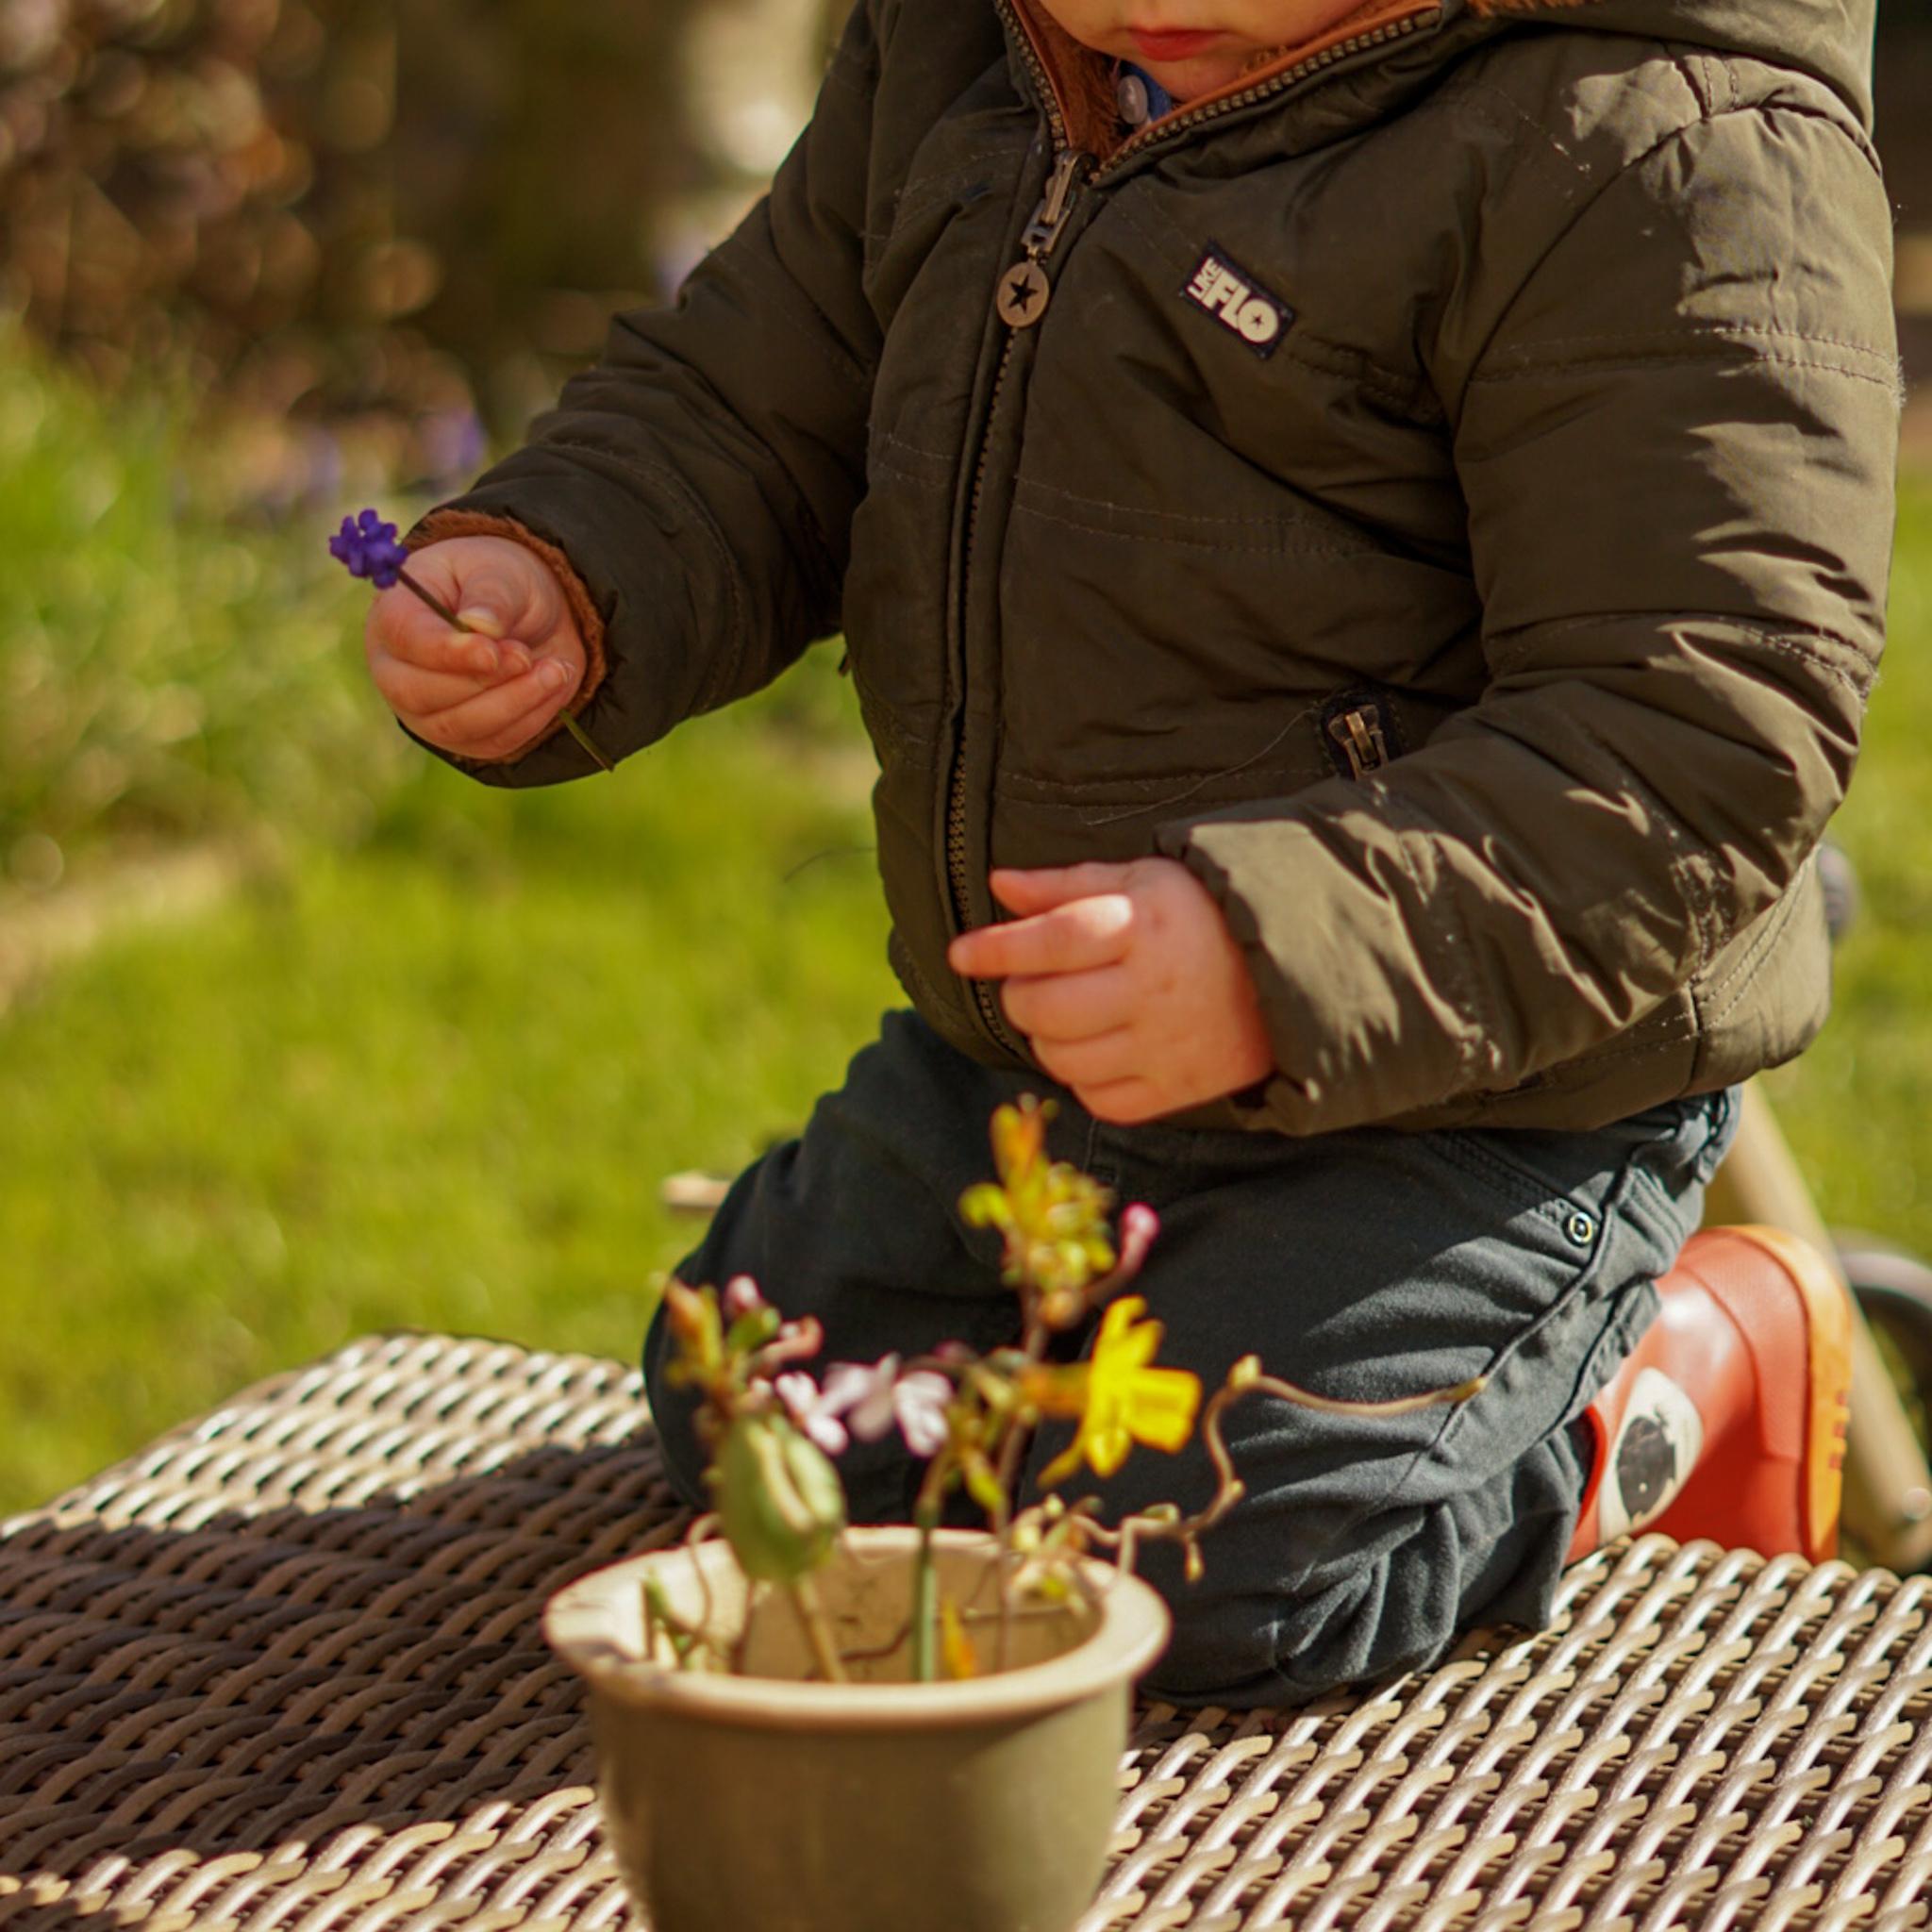 Lente bloemstukje maken met je dreumes